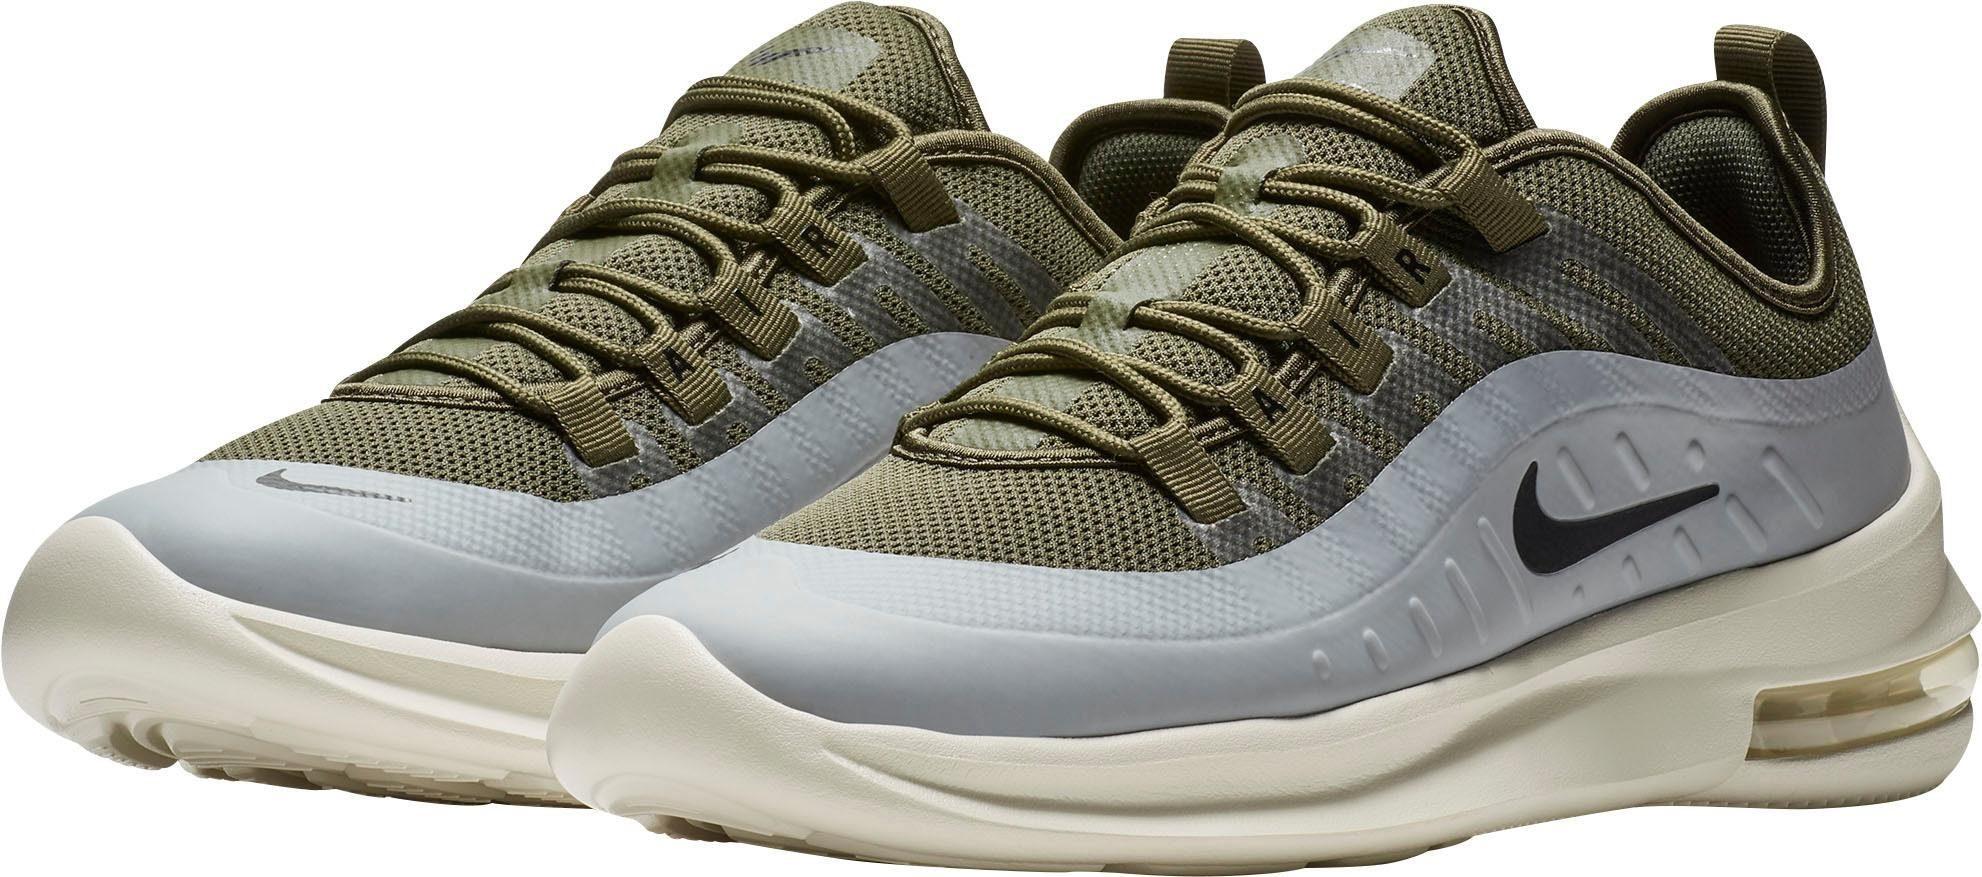 AboutYou | Herren Nike Sportswear Sneaker 'Air Max Axis